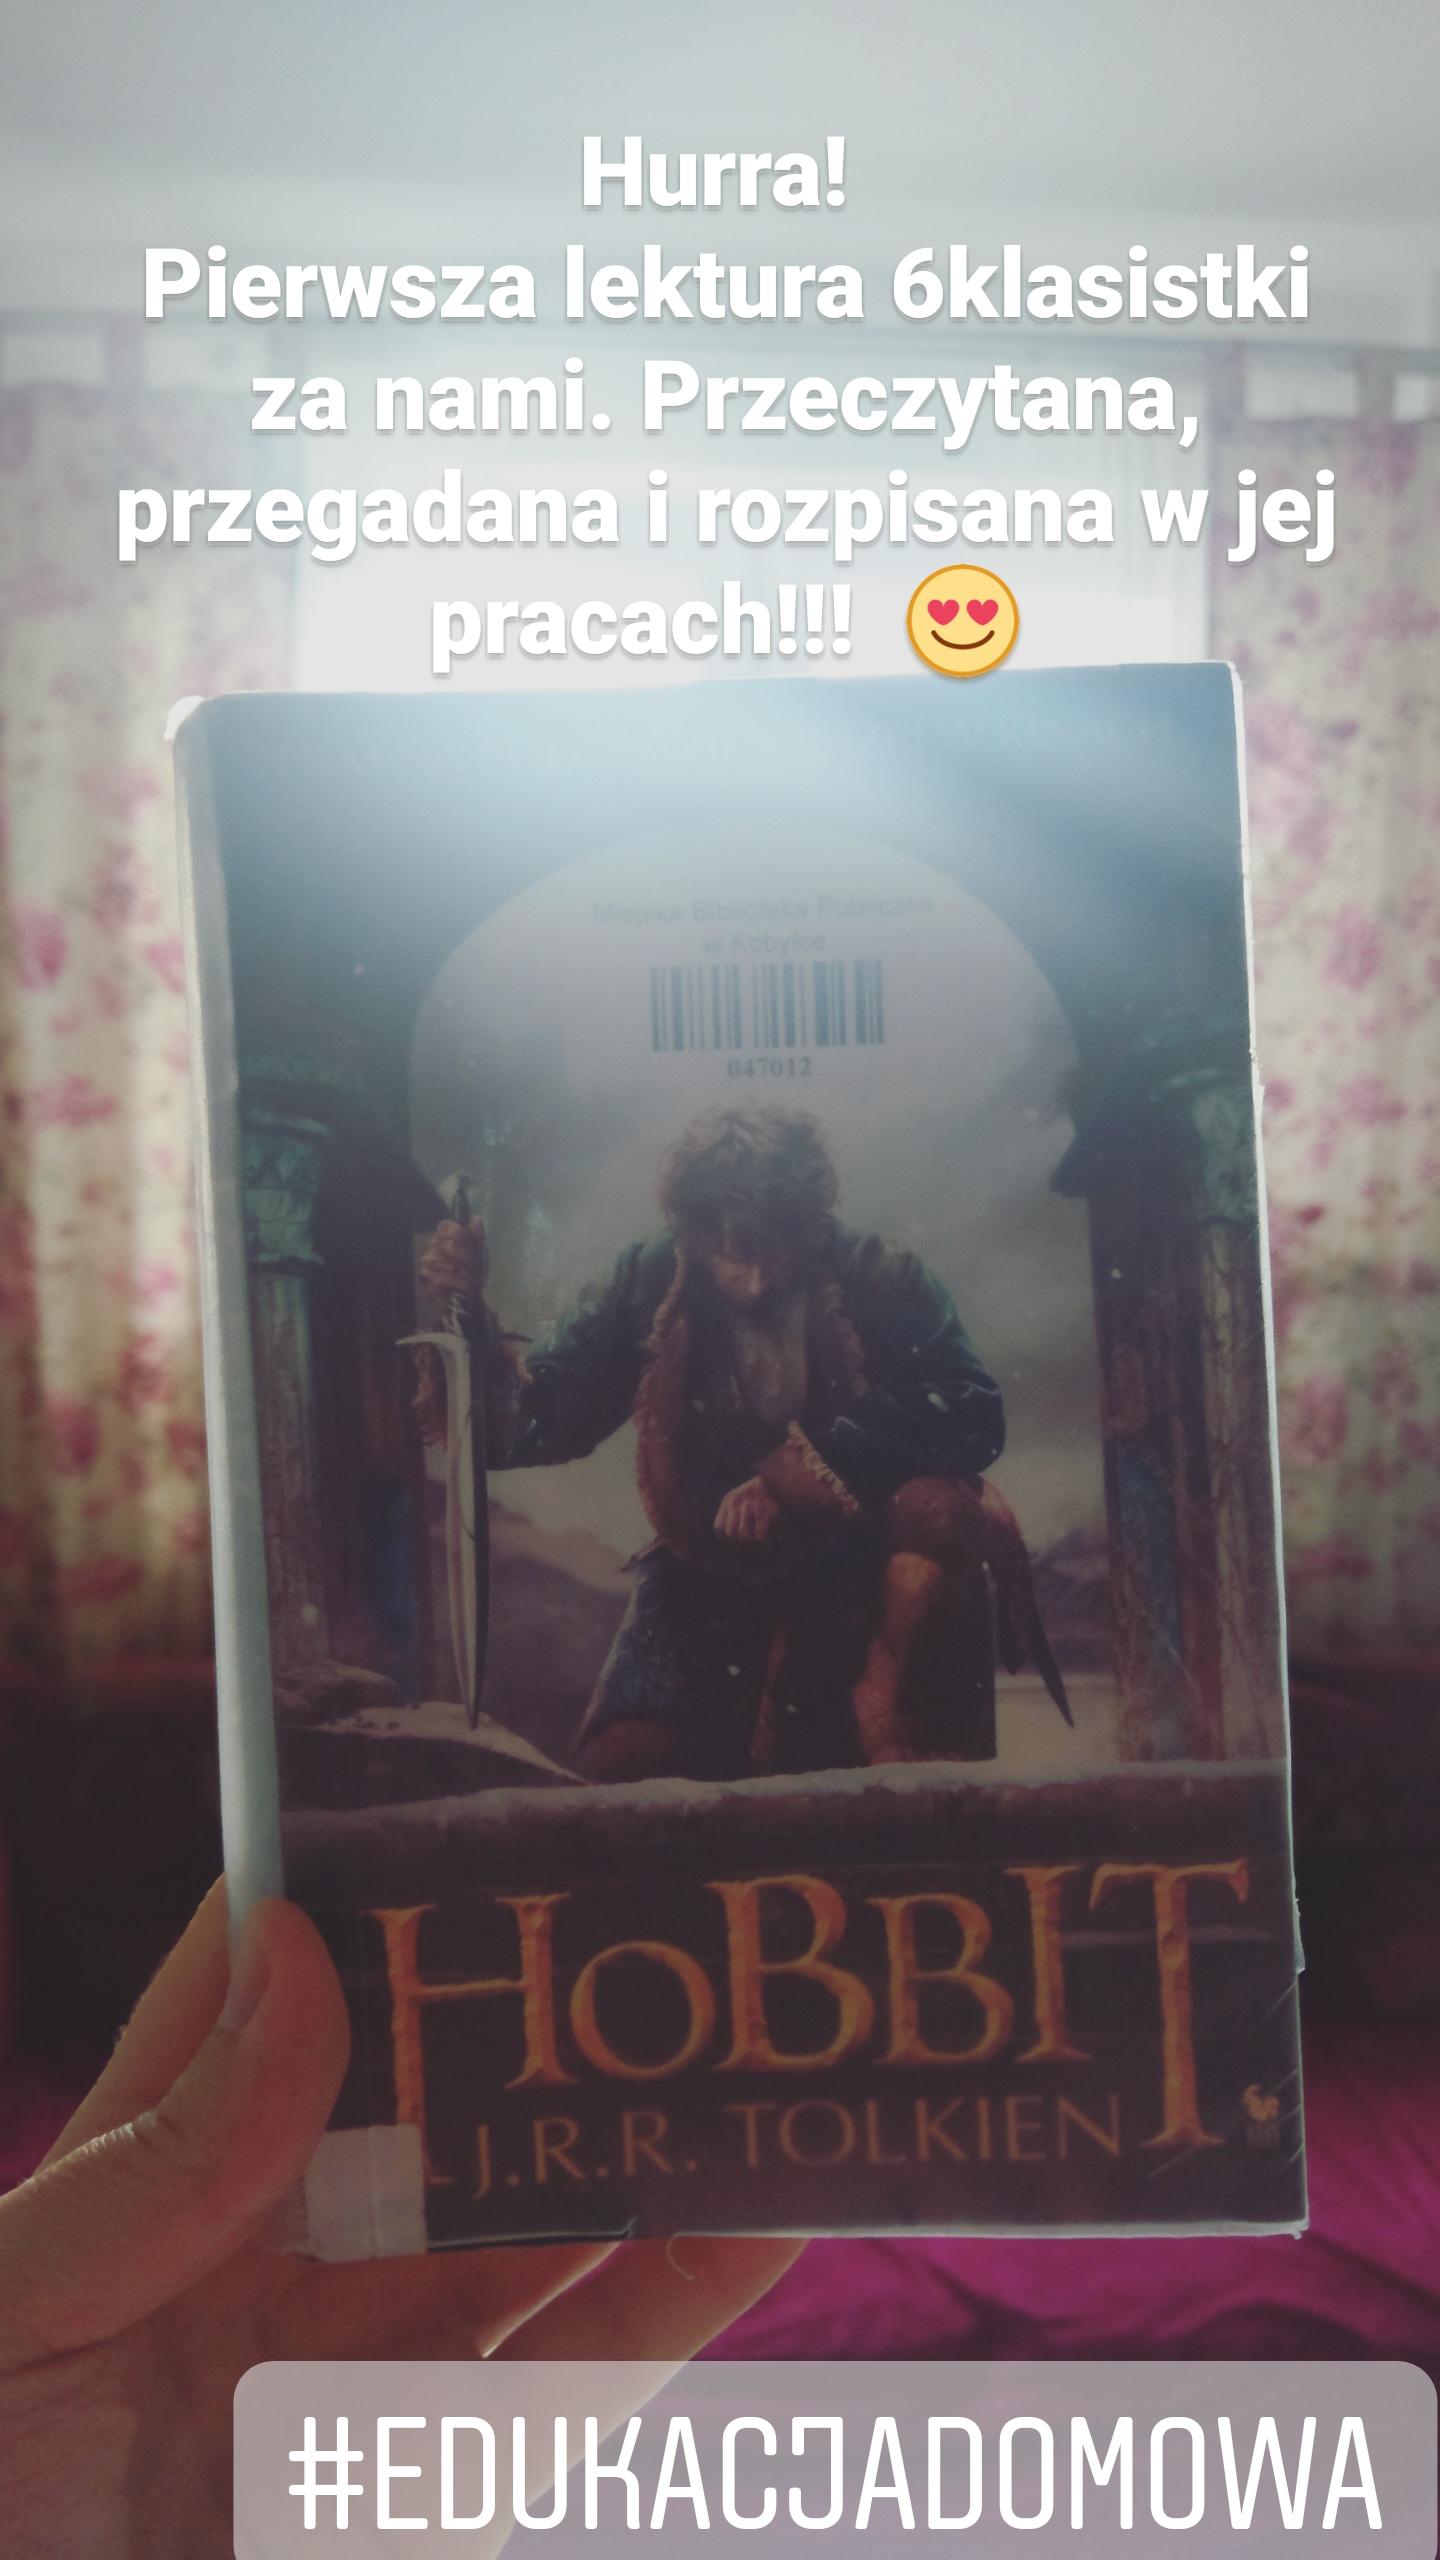 Hobbit - pierwsza lektura za nami - ED #12